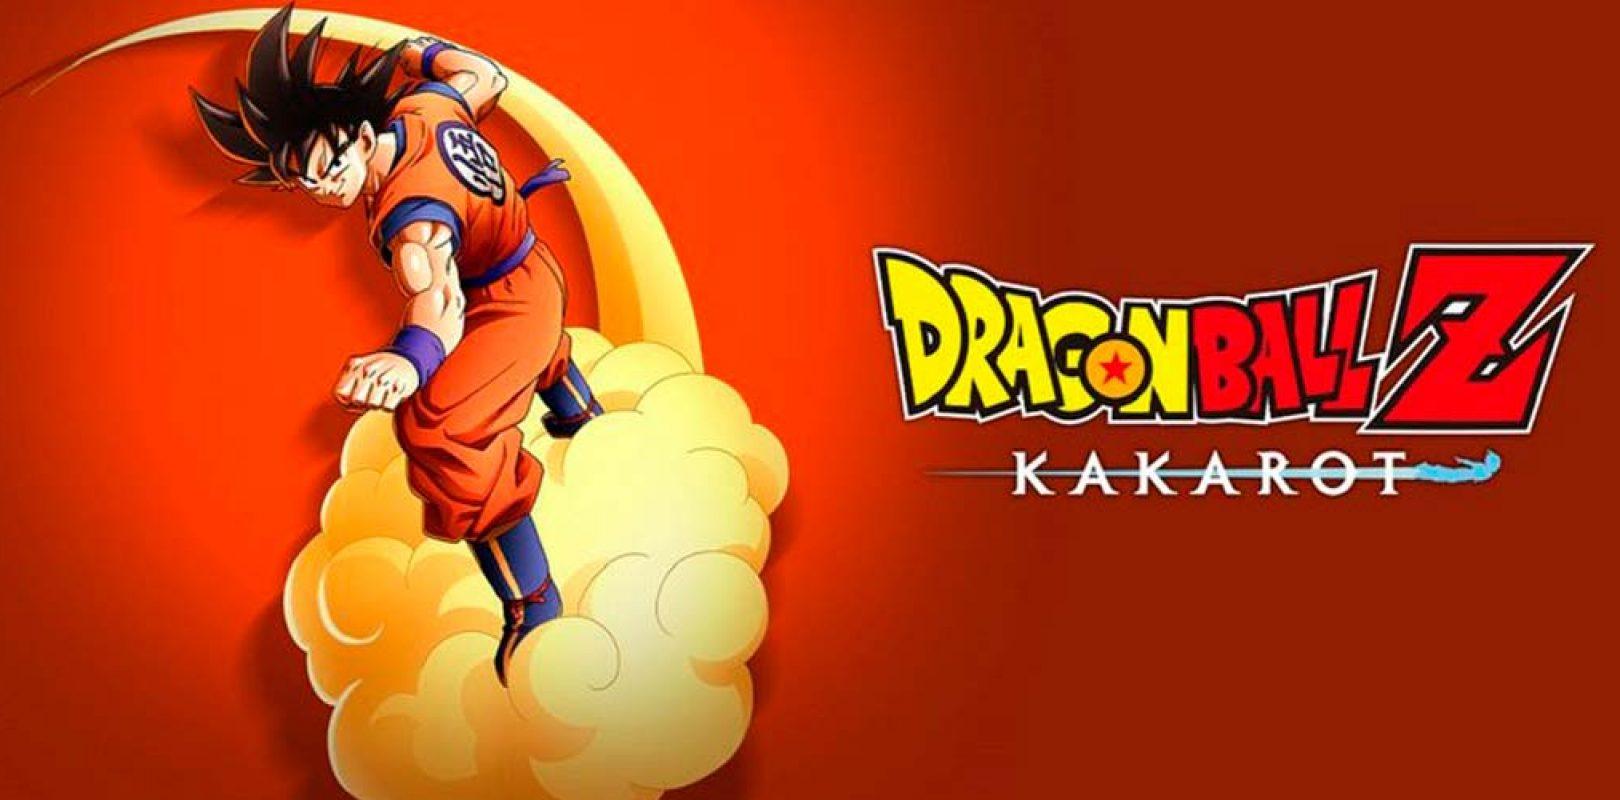 Dragon Ball Z Kakarot recensione: un salto nel passato insieme a Goku thumbnail